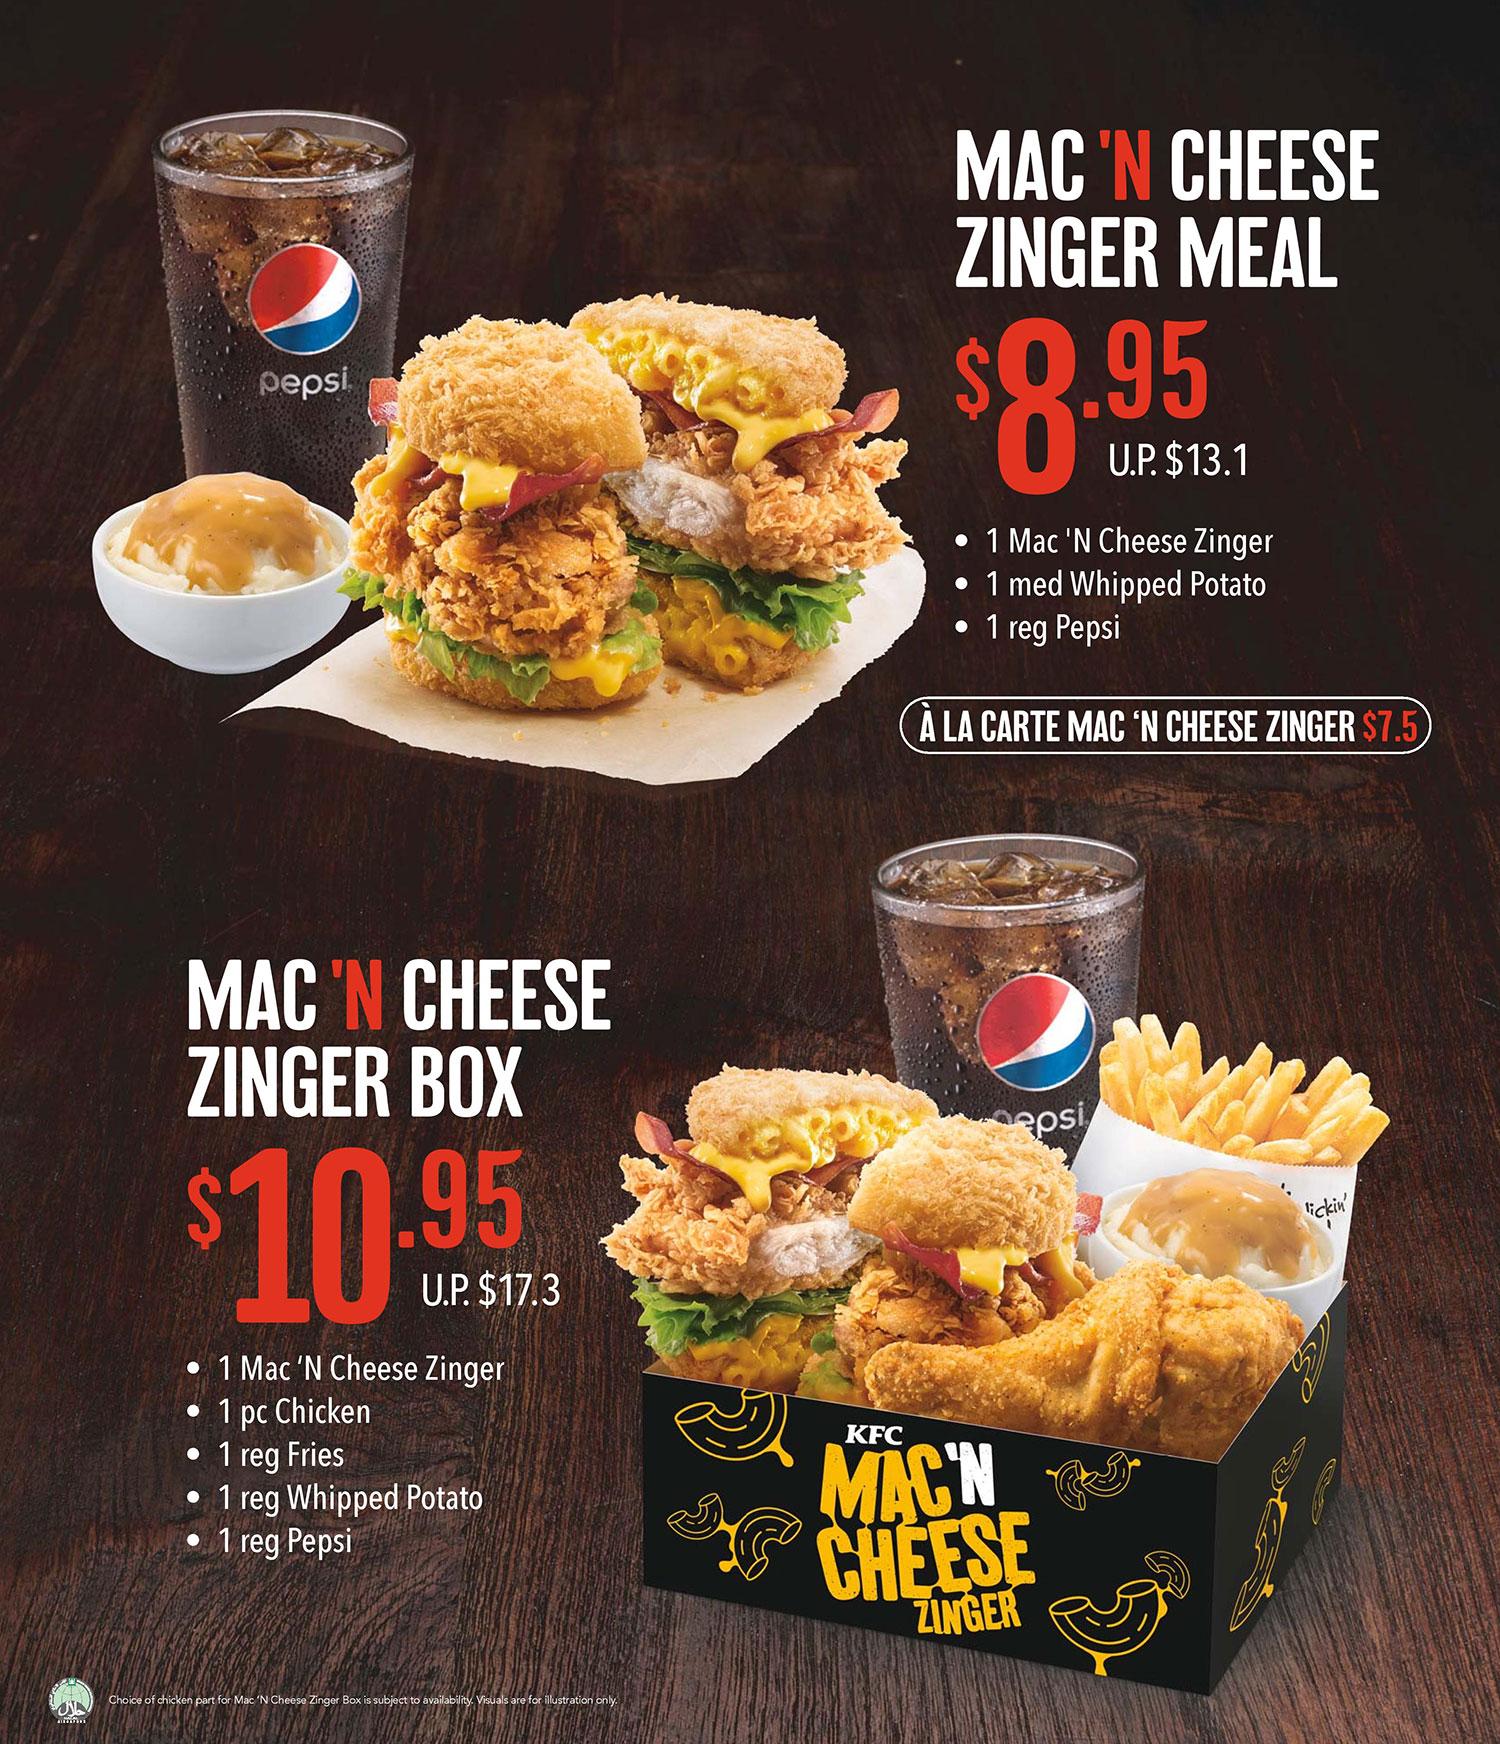 KFC Singapore newest creation – the KFC Mac 'N Cheese Zinger!